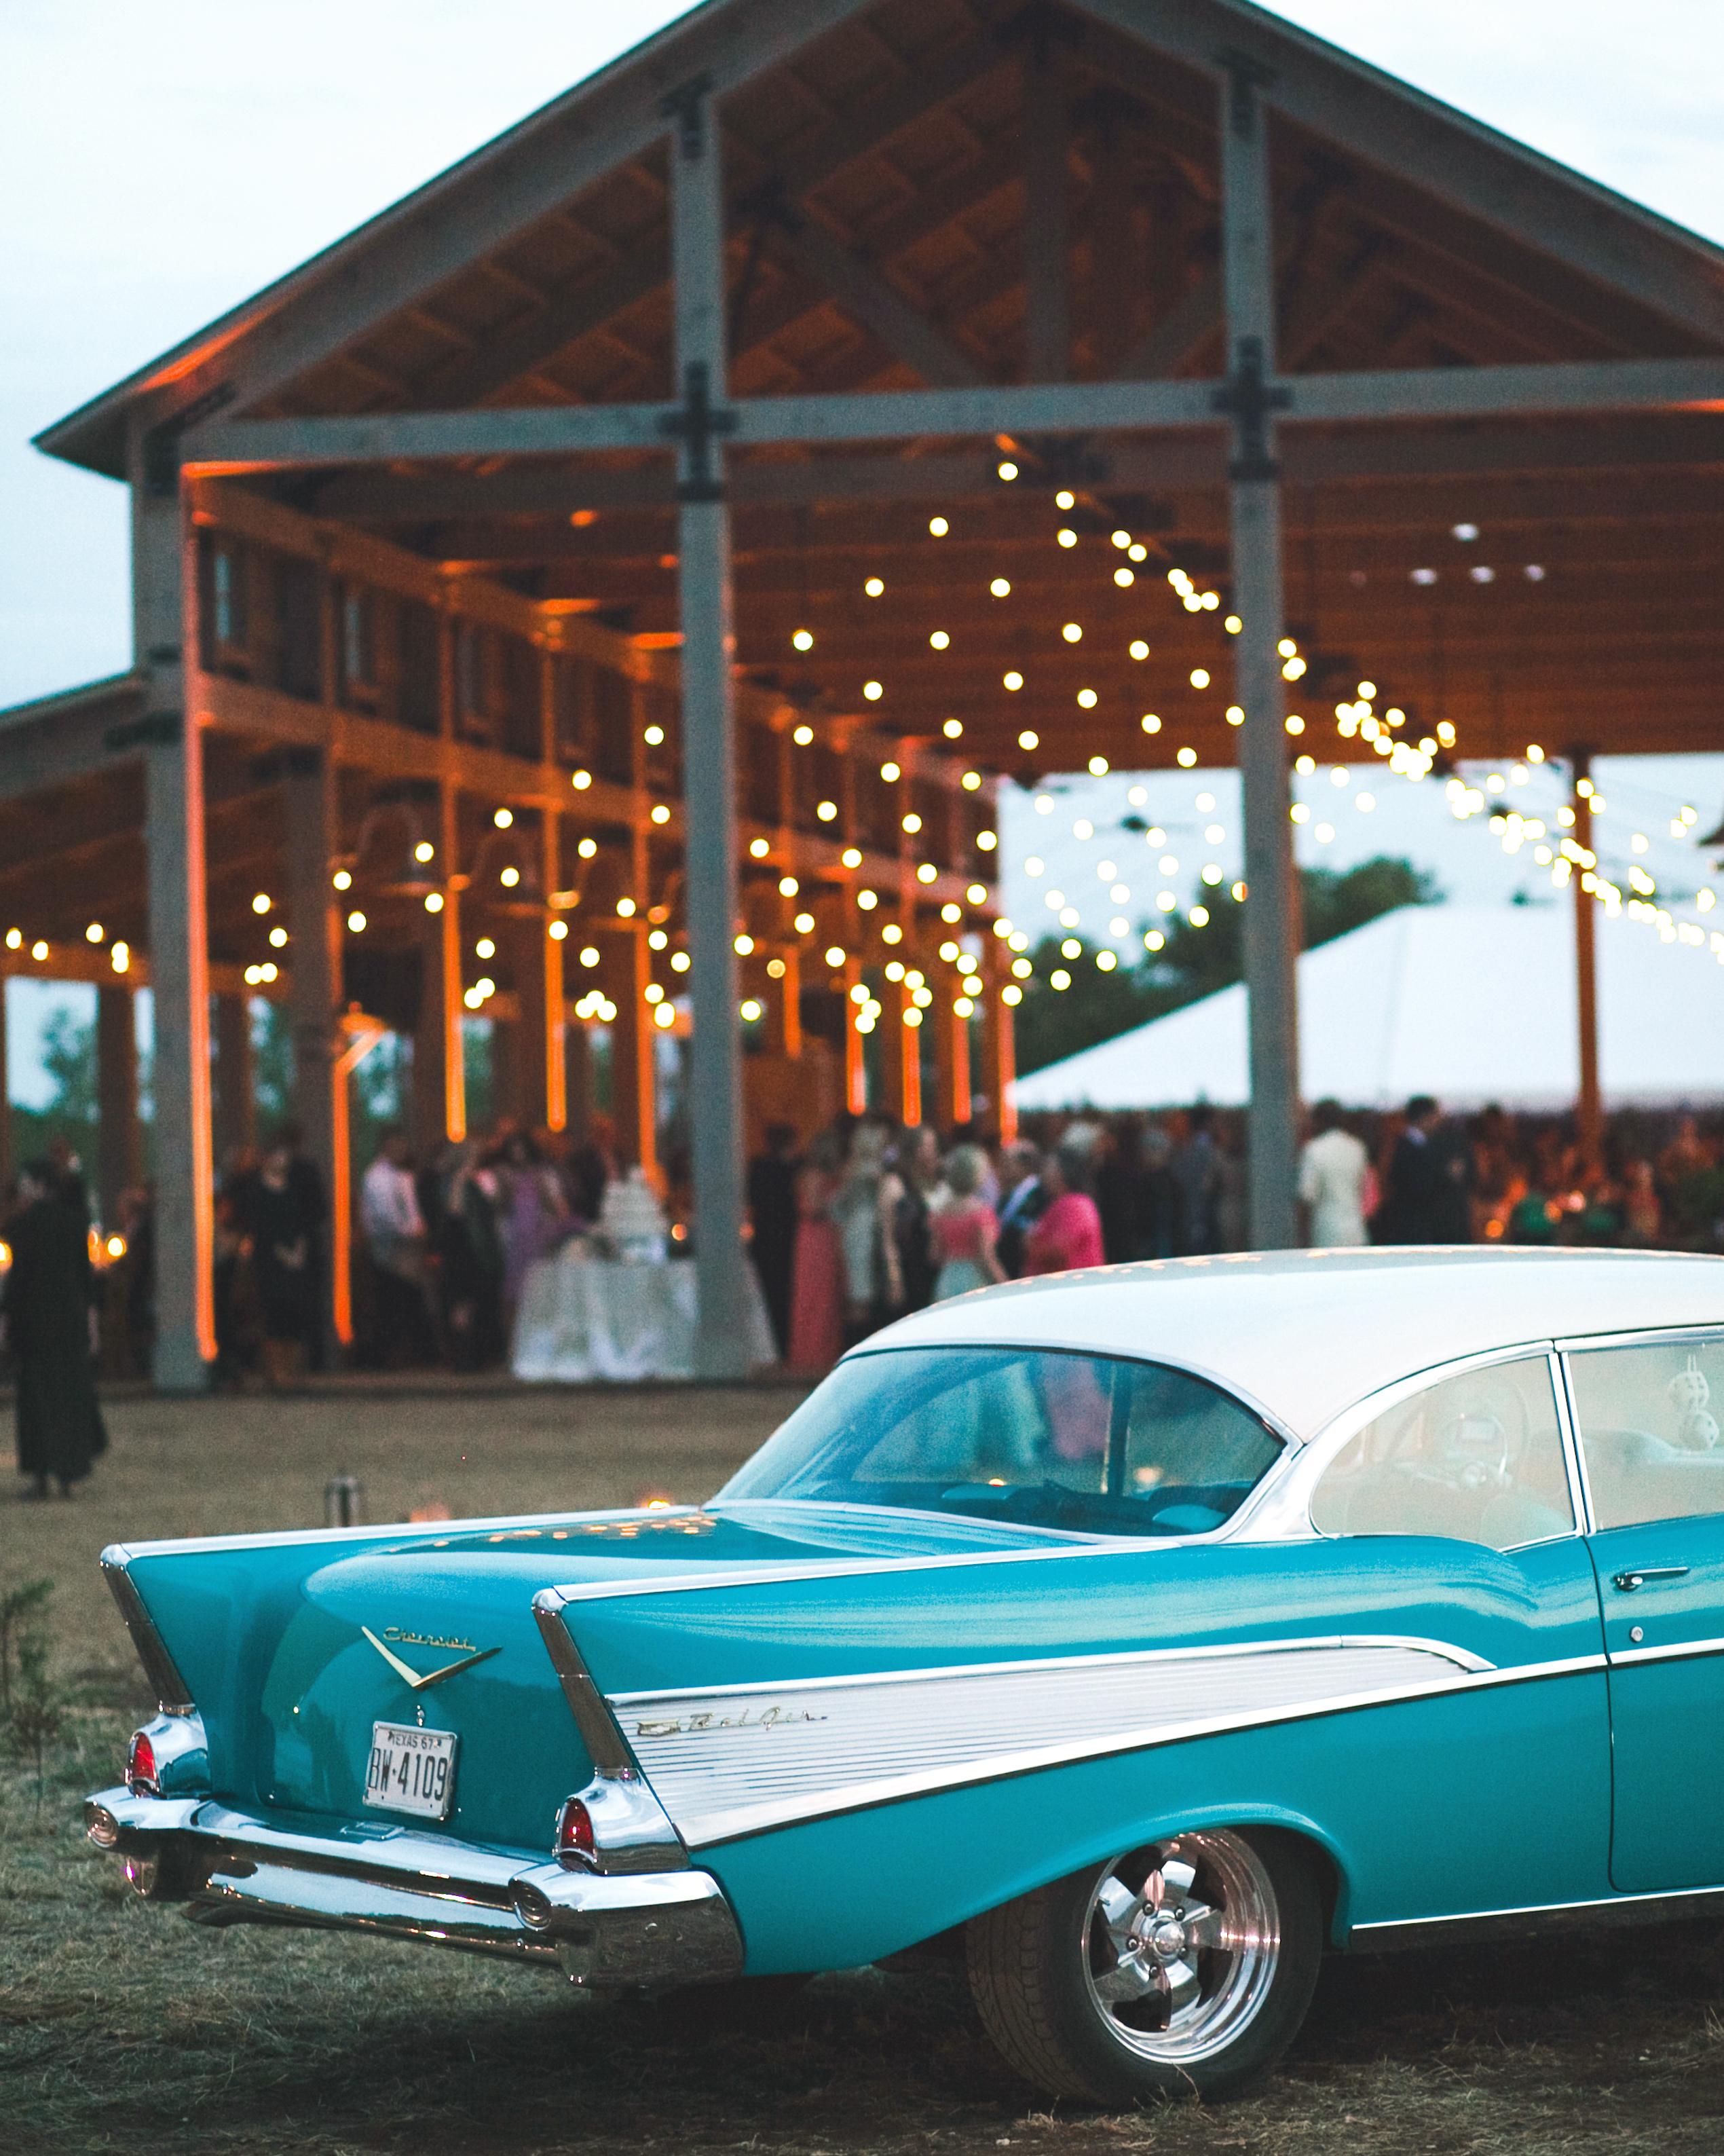 heather-tibaut-wedding-car-0314.jpg